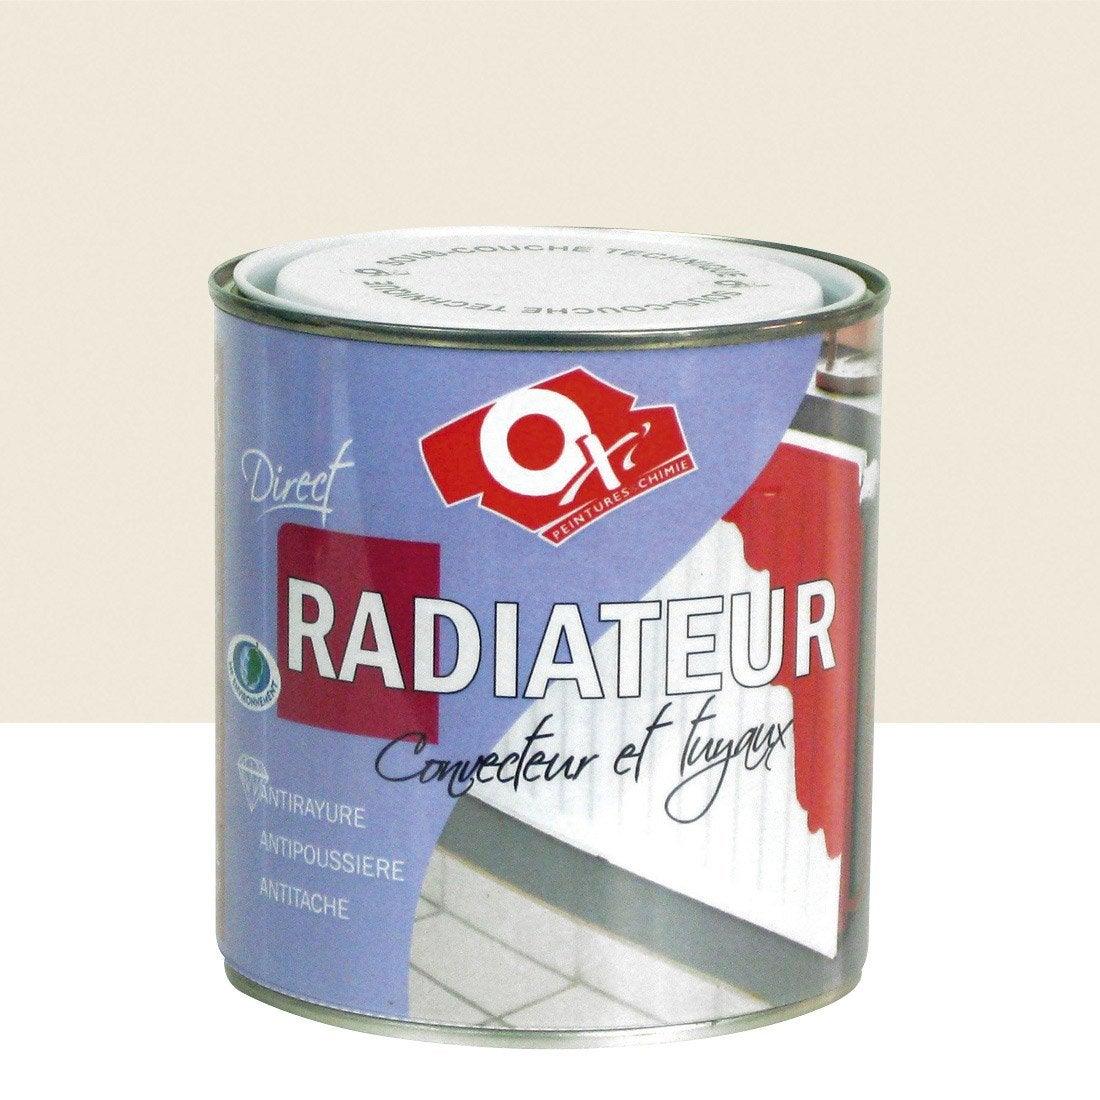 Peinture ox 39 oxytol ivoire 0 5 l leroy merlin - Peinture radiateur leroy merlin ...